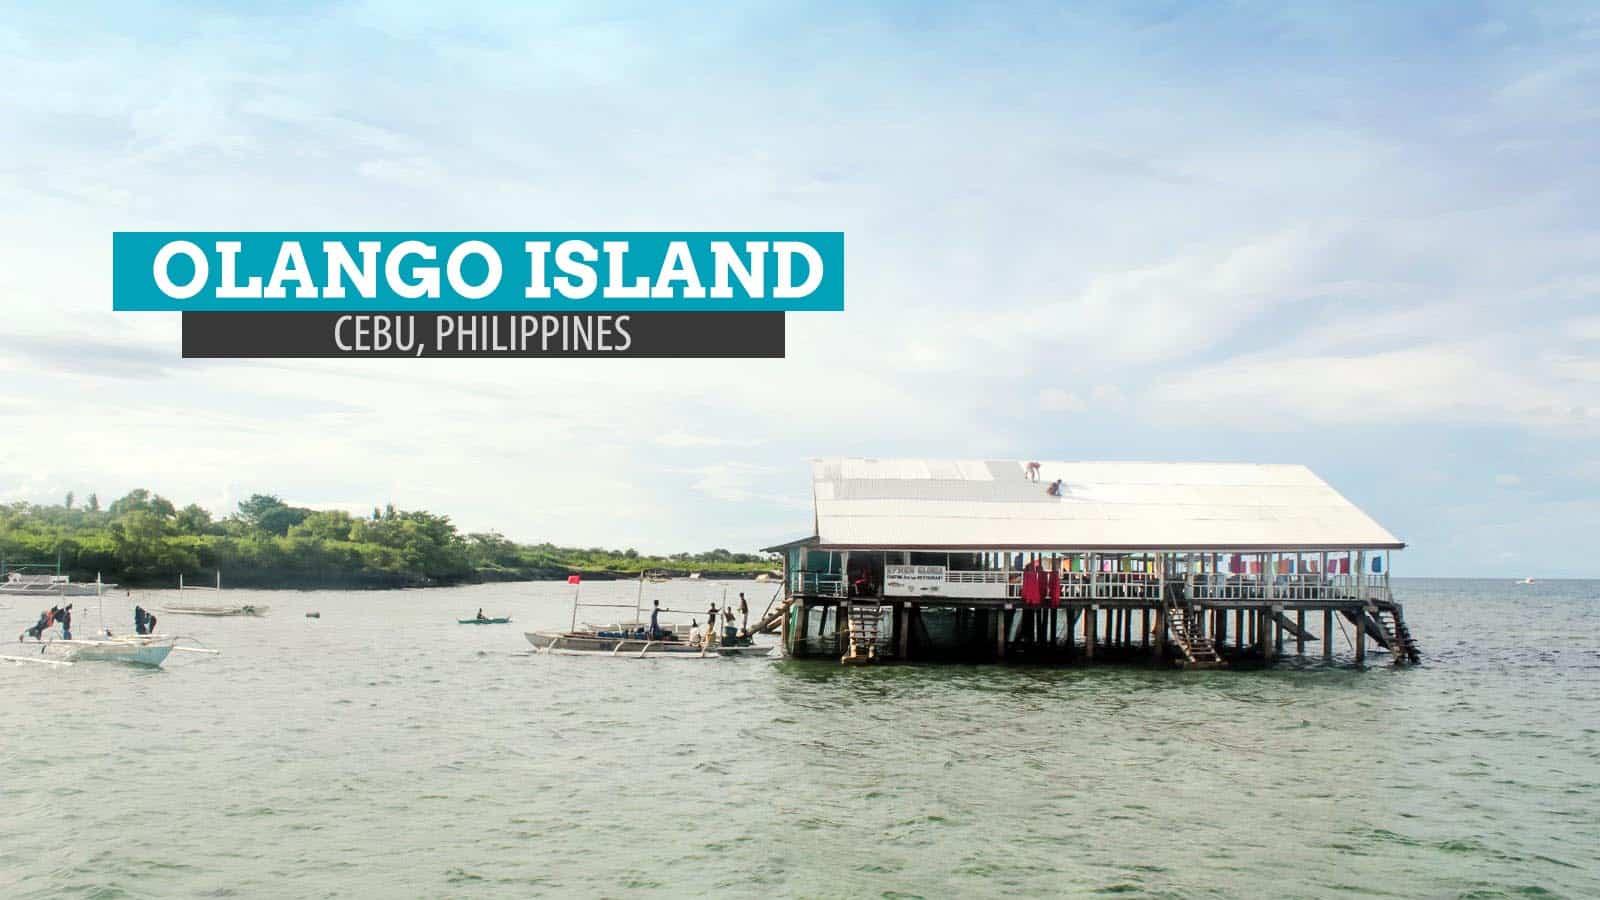 Cao-oy, Olango Island: Seafood and Stilts in Cebu, Philippines